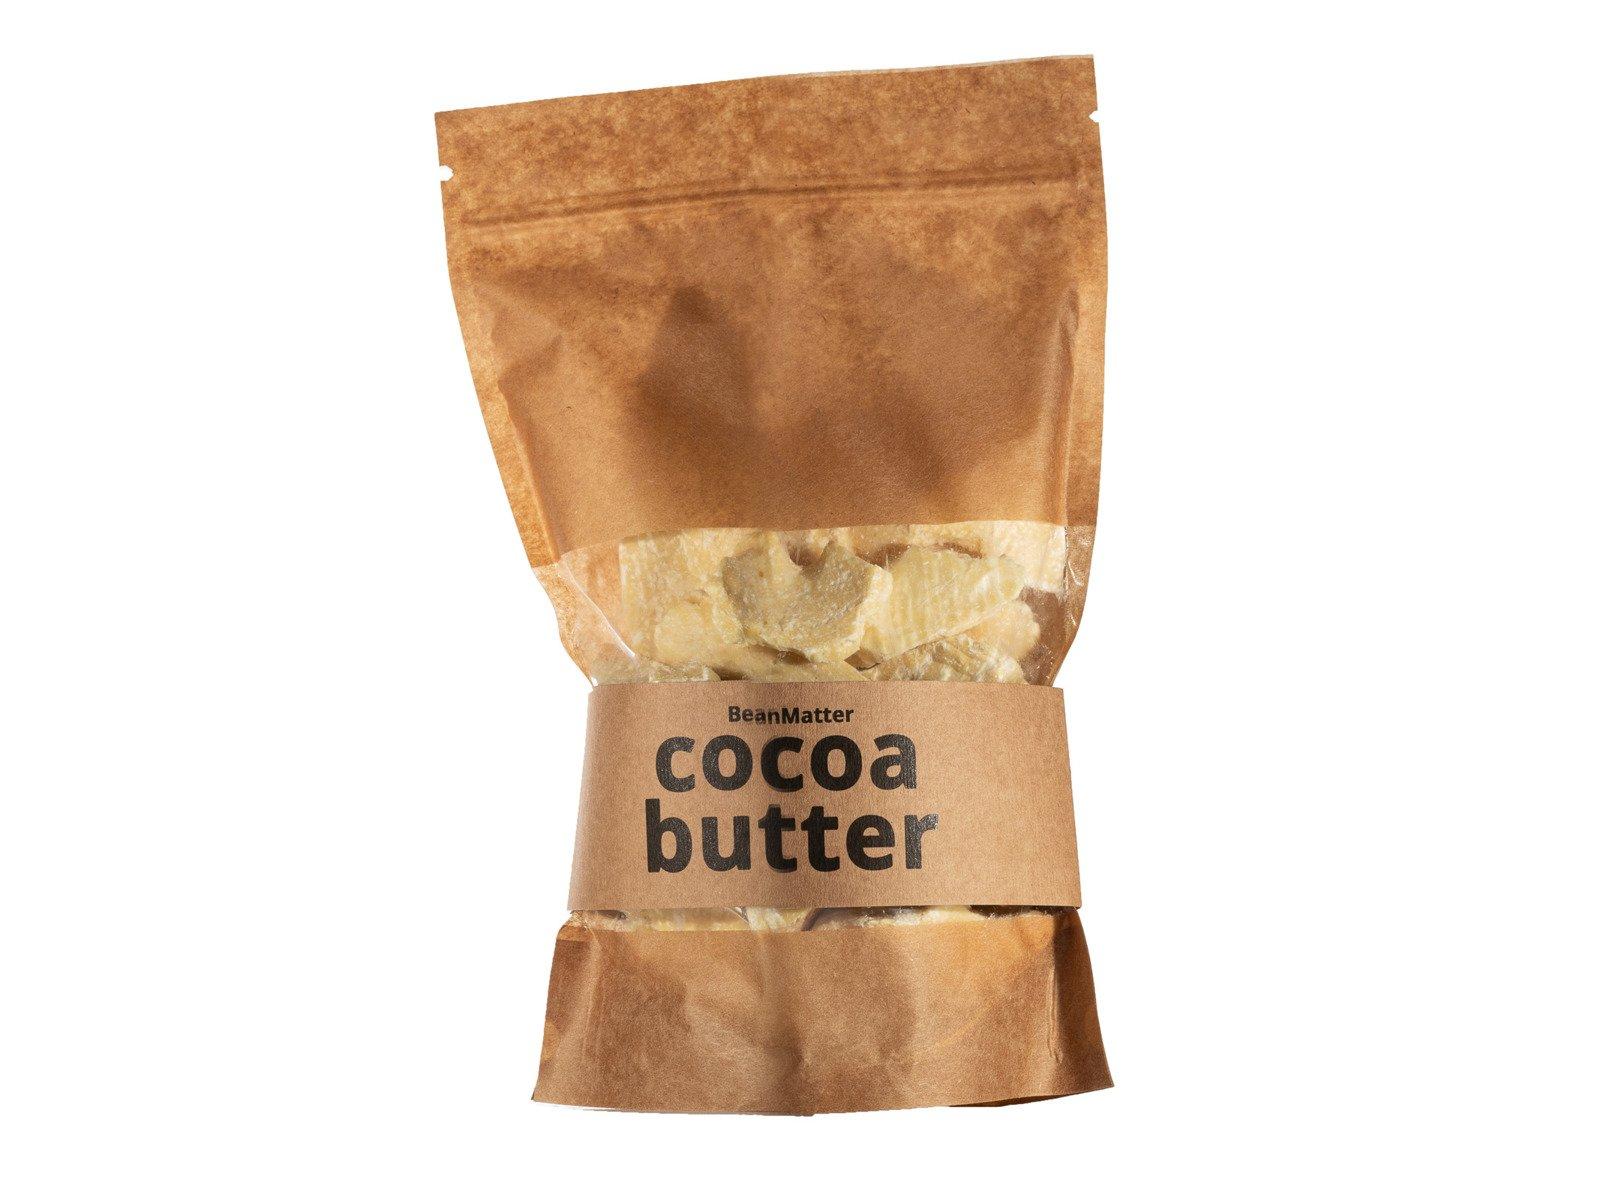 Cocoa Butter - 250g - Natural Unrefined Cacao Butter Ecuador Food Grade